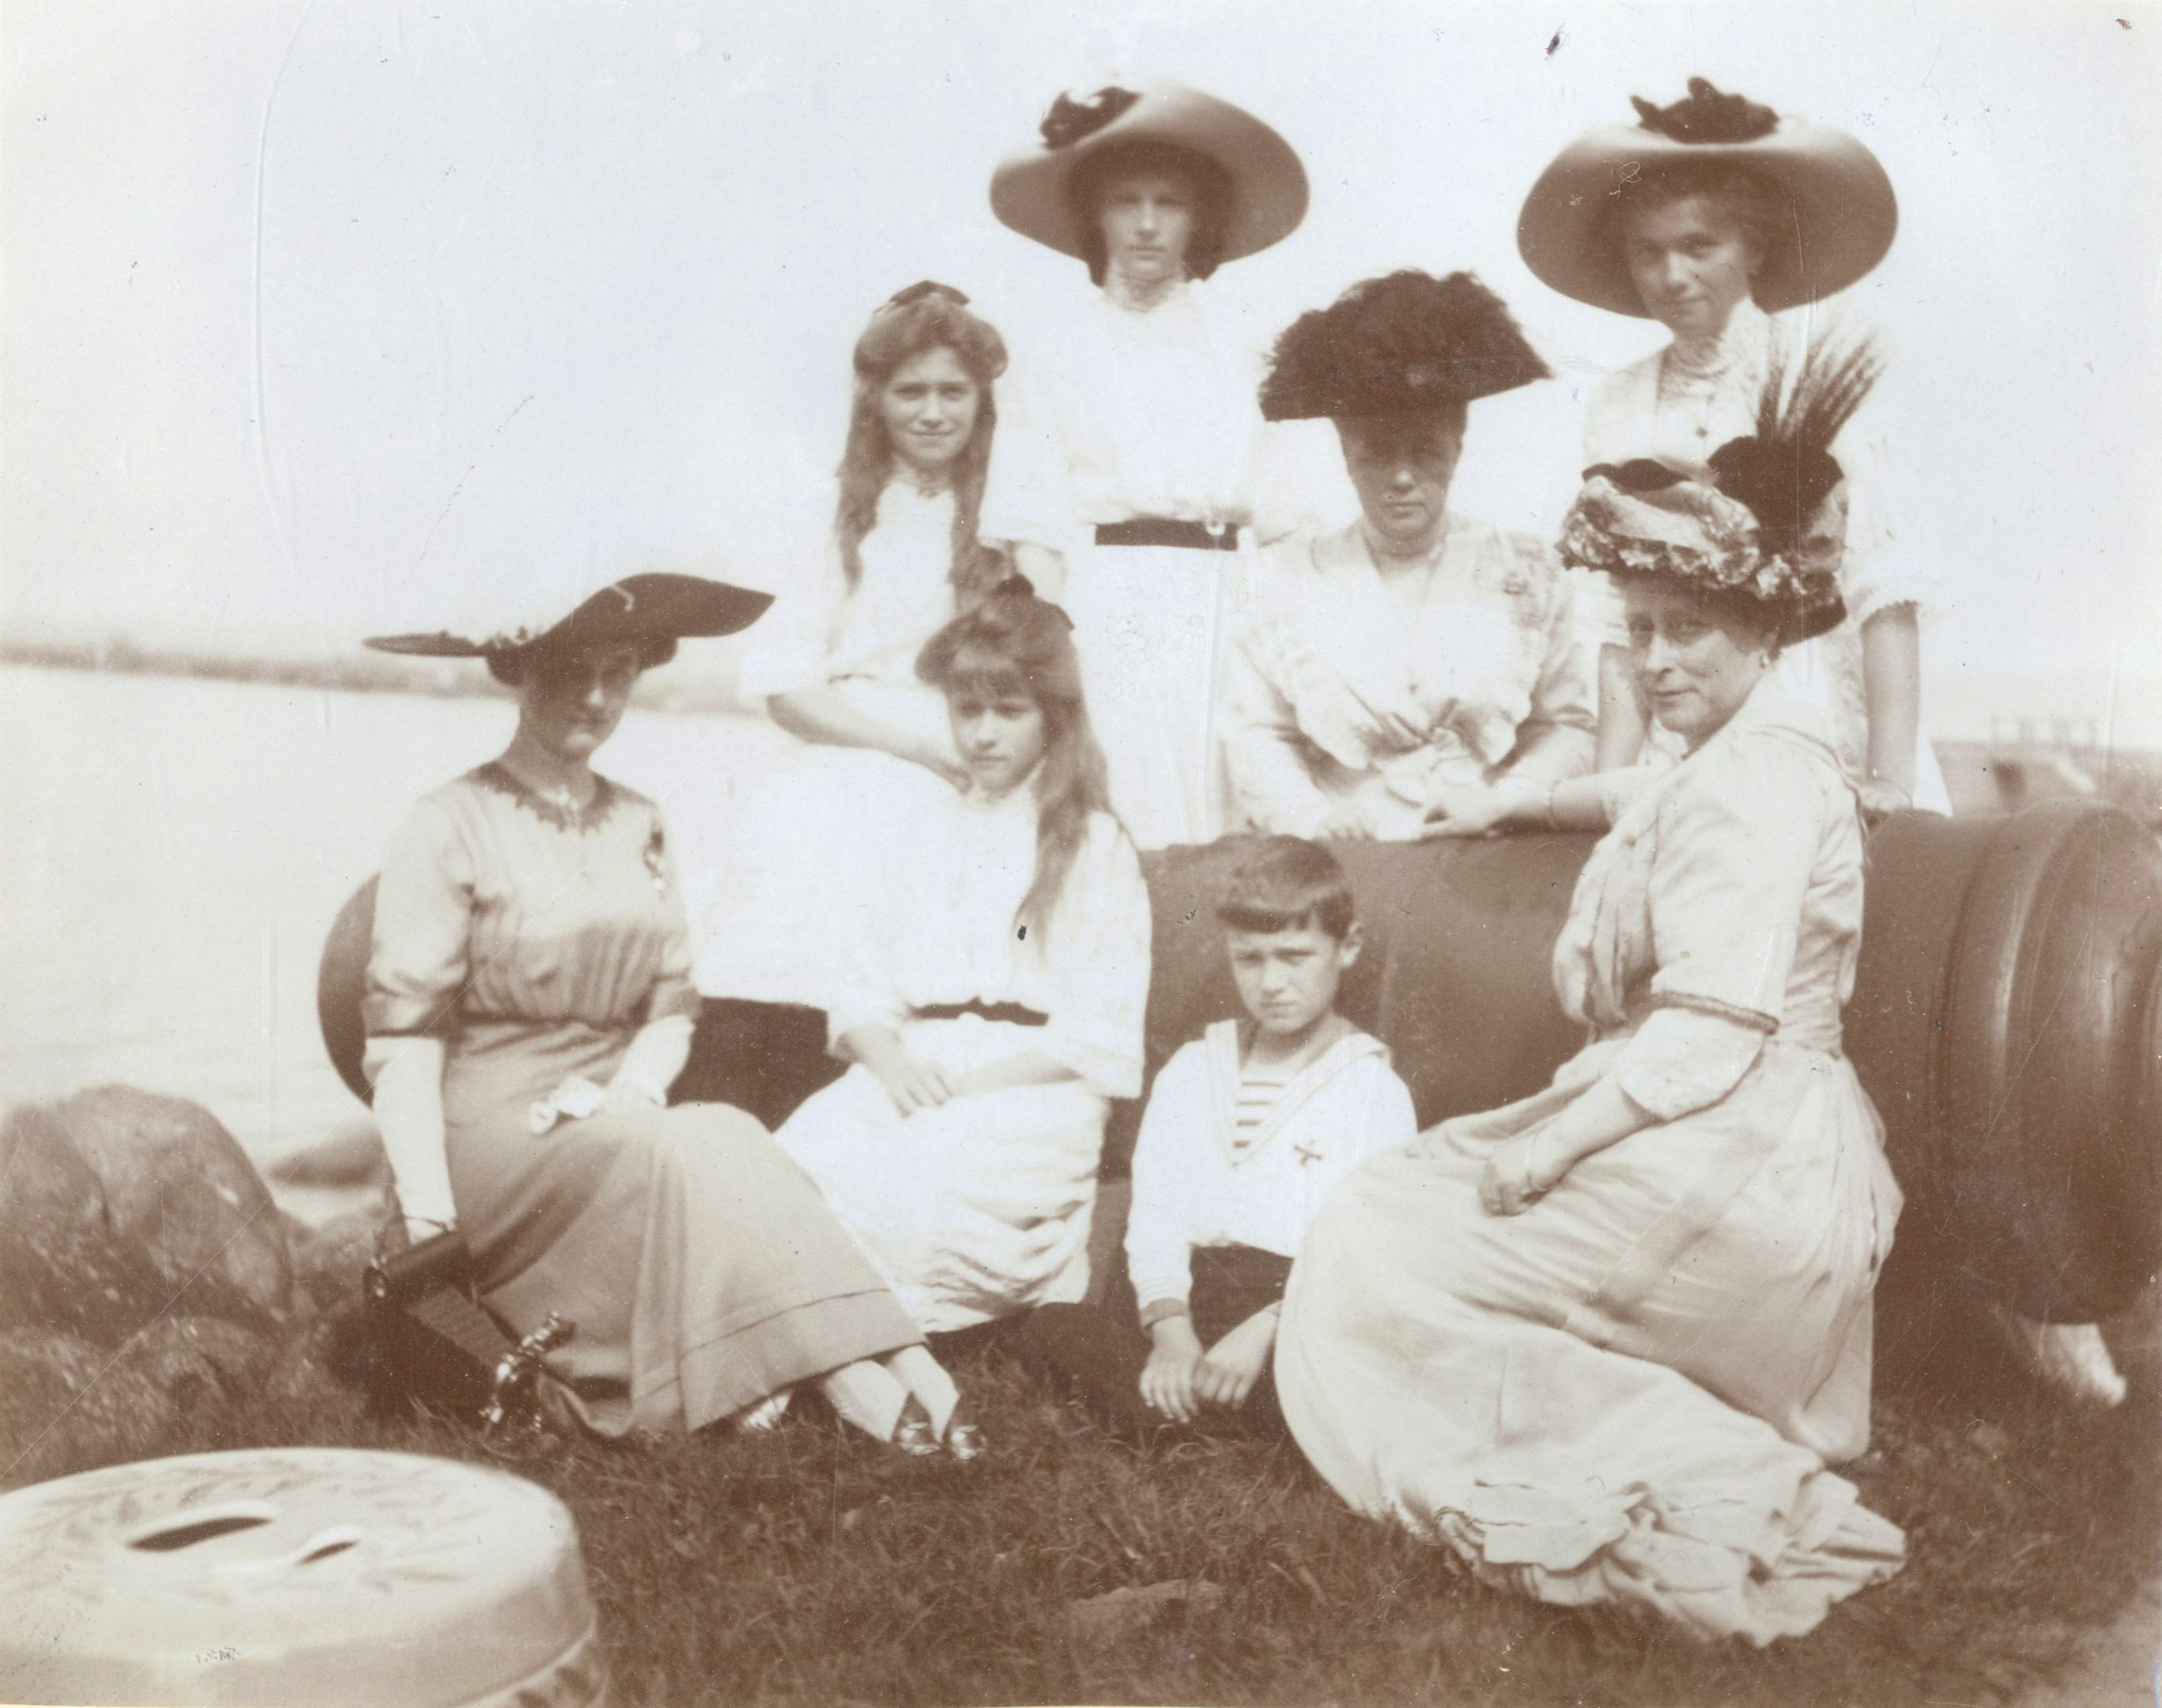 Princess Victoria, Princess of Battenberg with her nieces and nephew, the Grand Duchesses Olga, Tatiana, Maria and Anastasia Nikolaevna of Russia, and Tsarevich Alexei Nikolaevich of Russia, with two others c.1912?